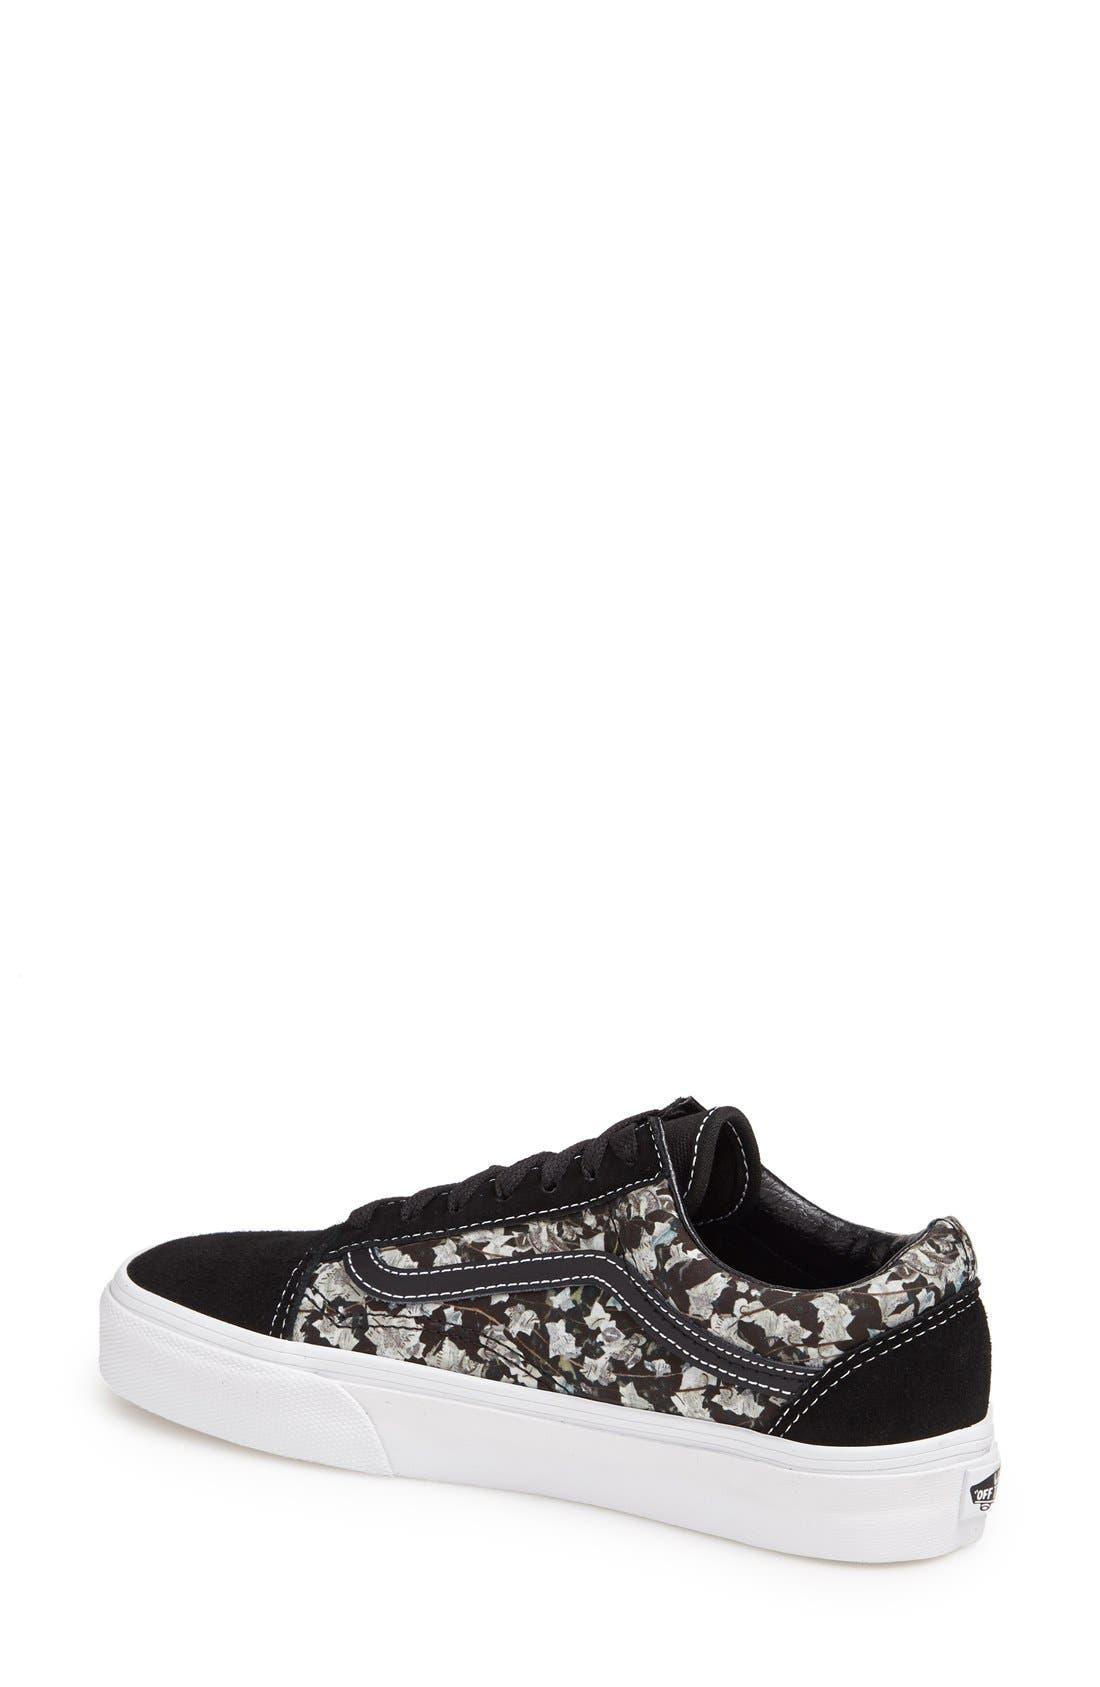 Alternate Image 2  - Vans 'Old Skool - Liberty Era' Sneaker (Women)